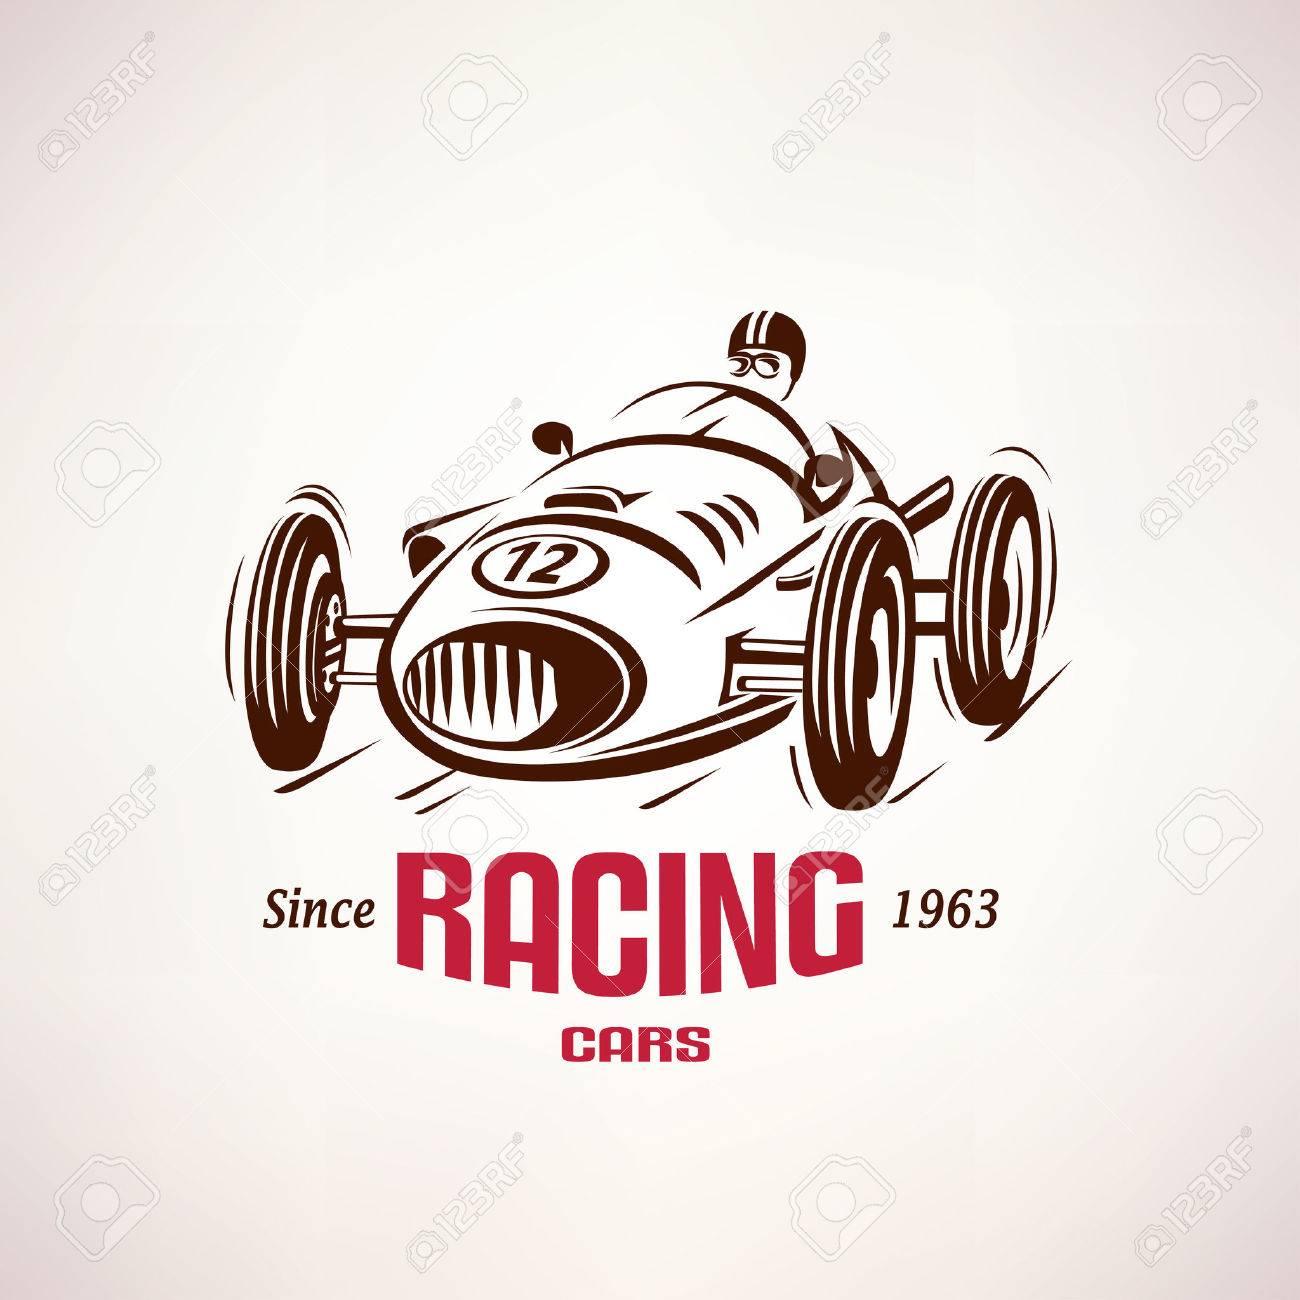 Retro Race Car Vintage Vector Symbol Emblem Label Template Royalty Free Cliparts Vectors And Stock Illustration Image 45333801